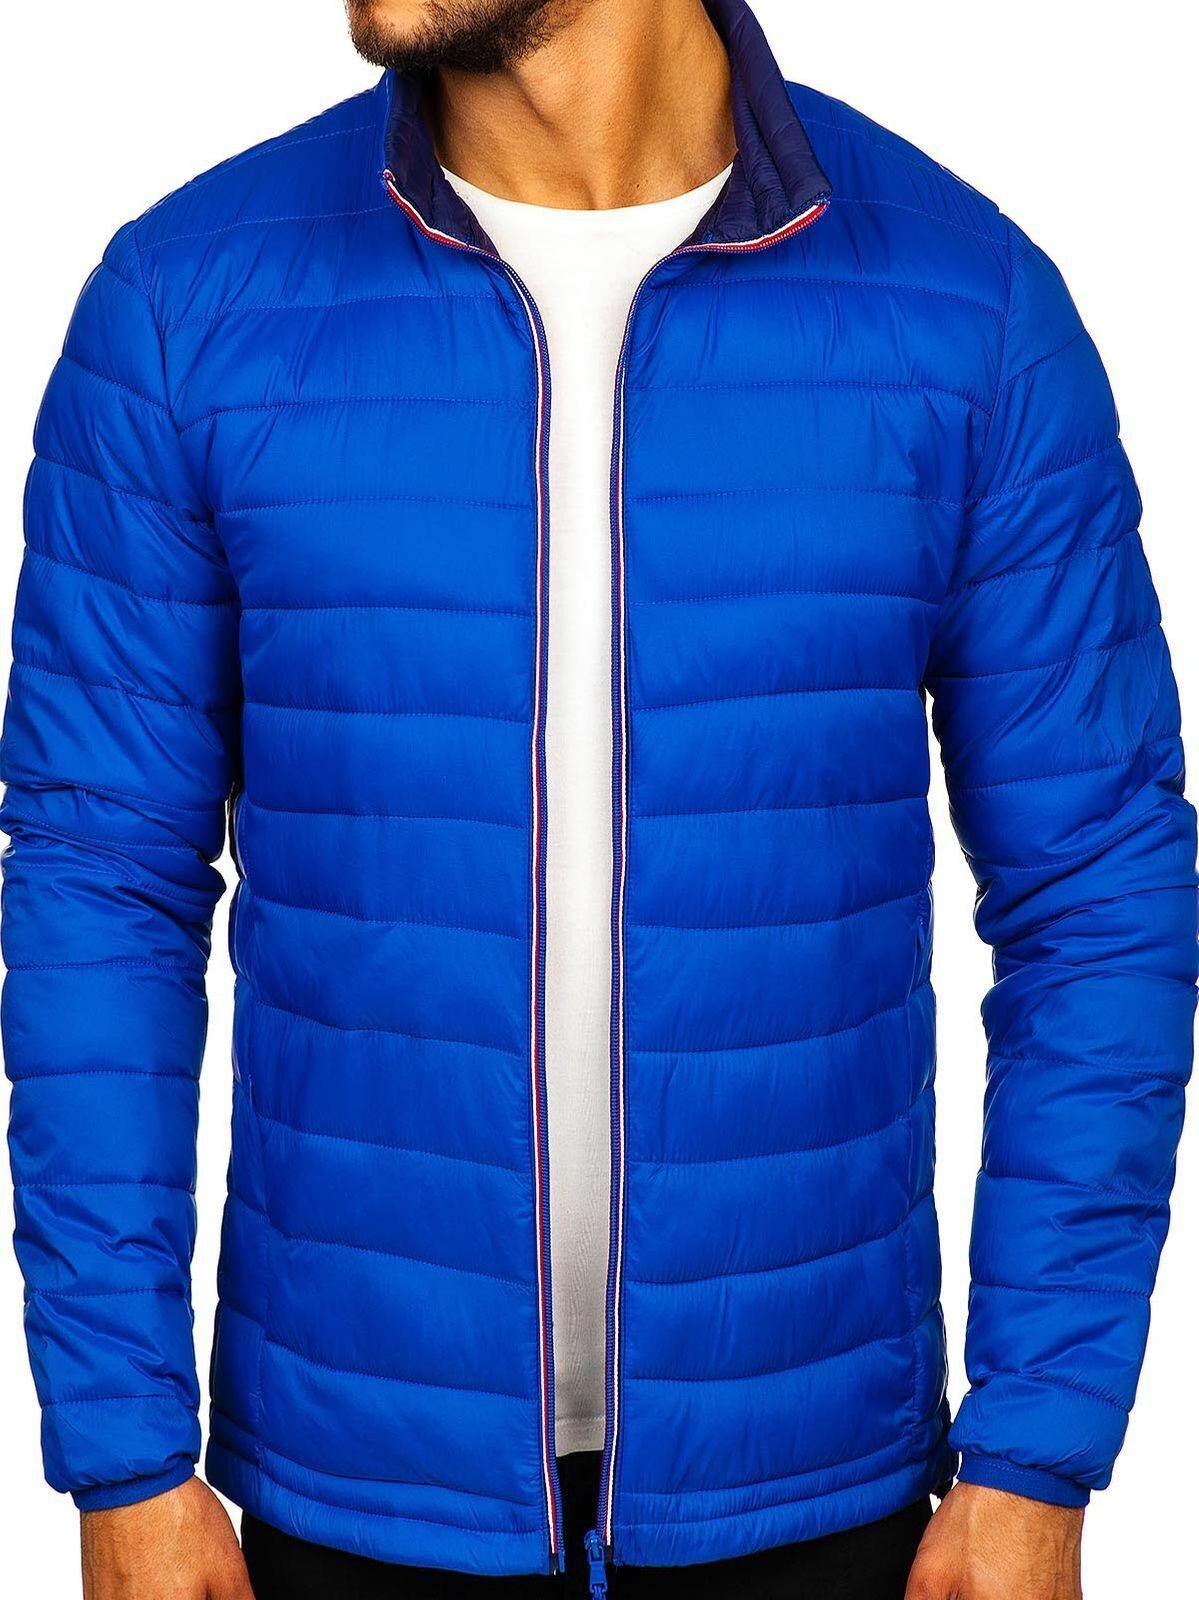 J.Style LY1017 Blau